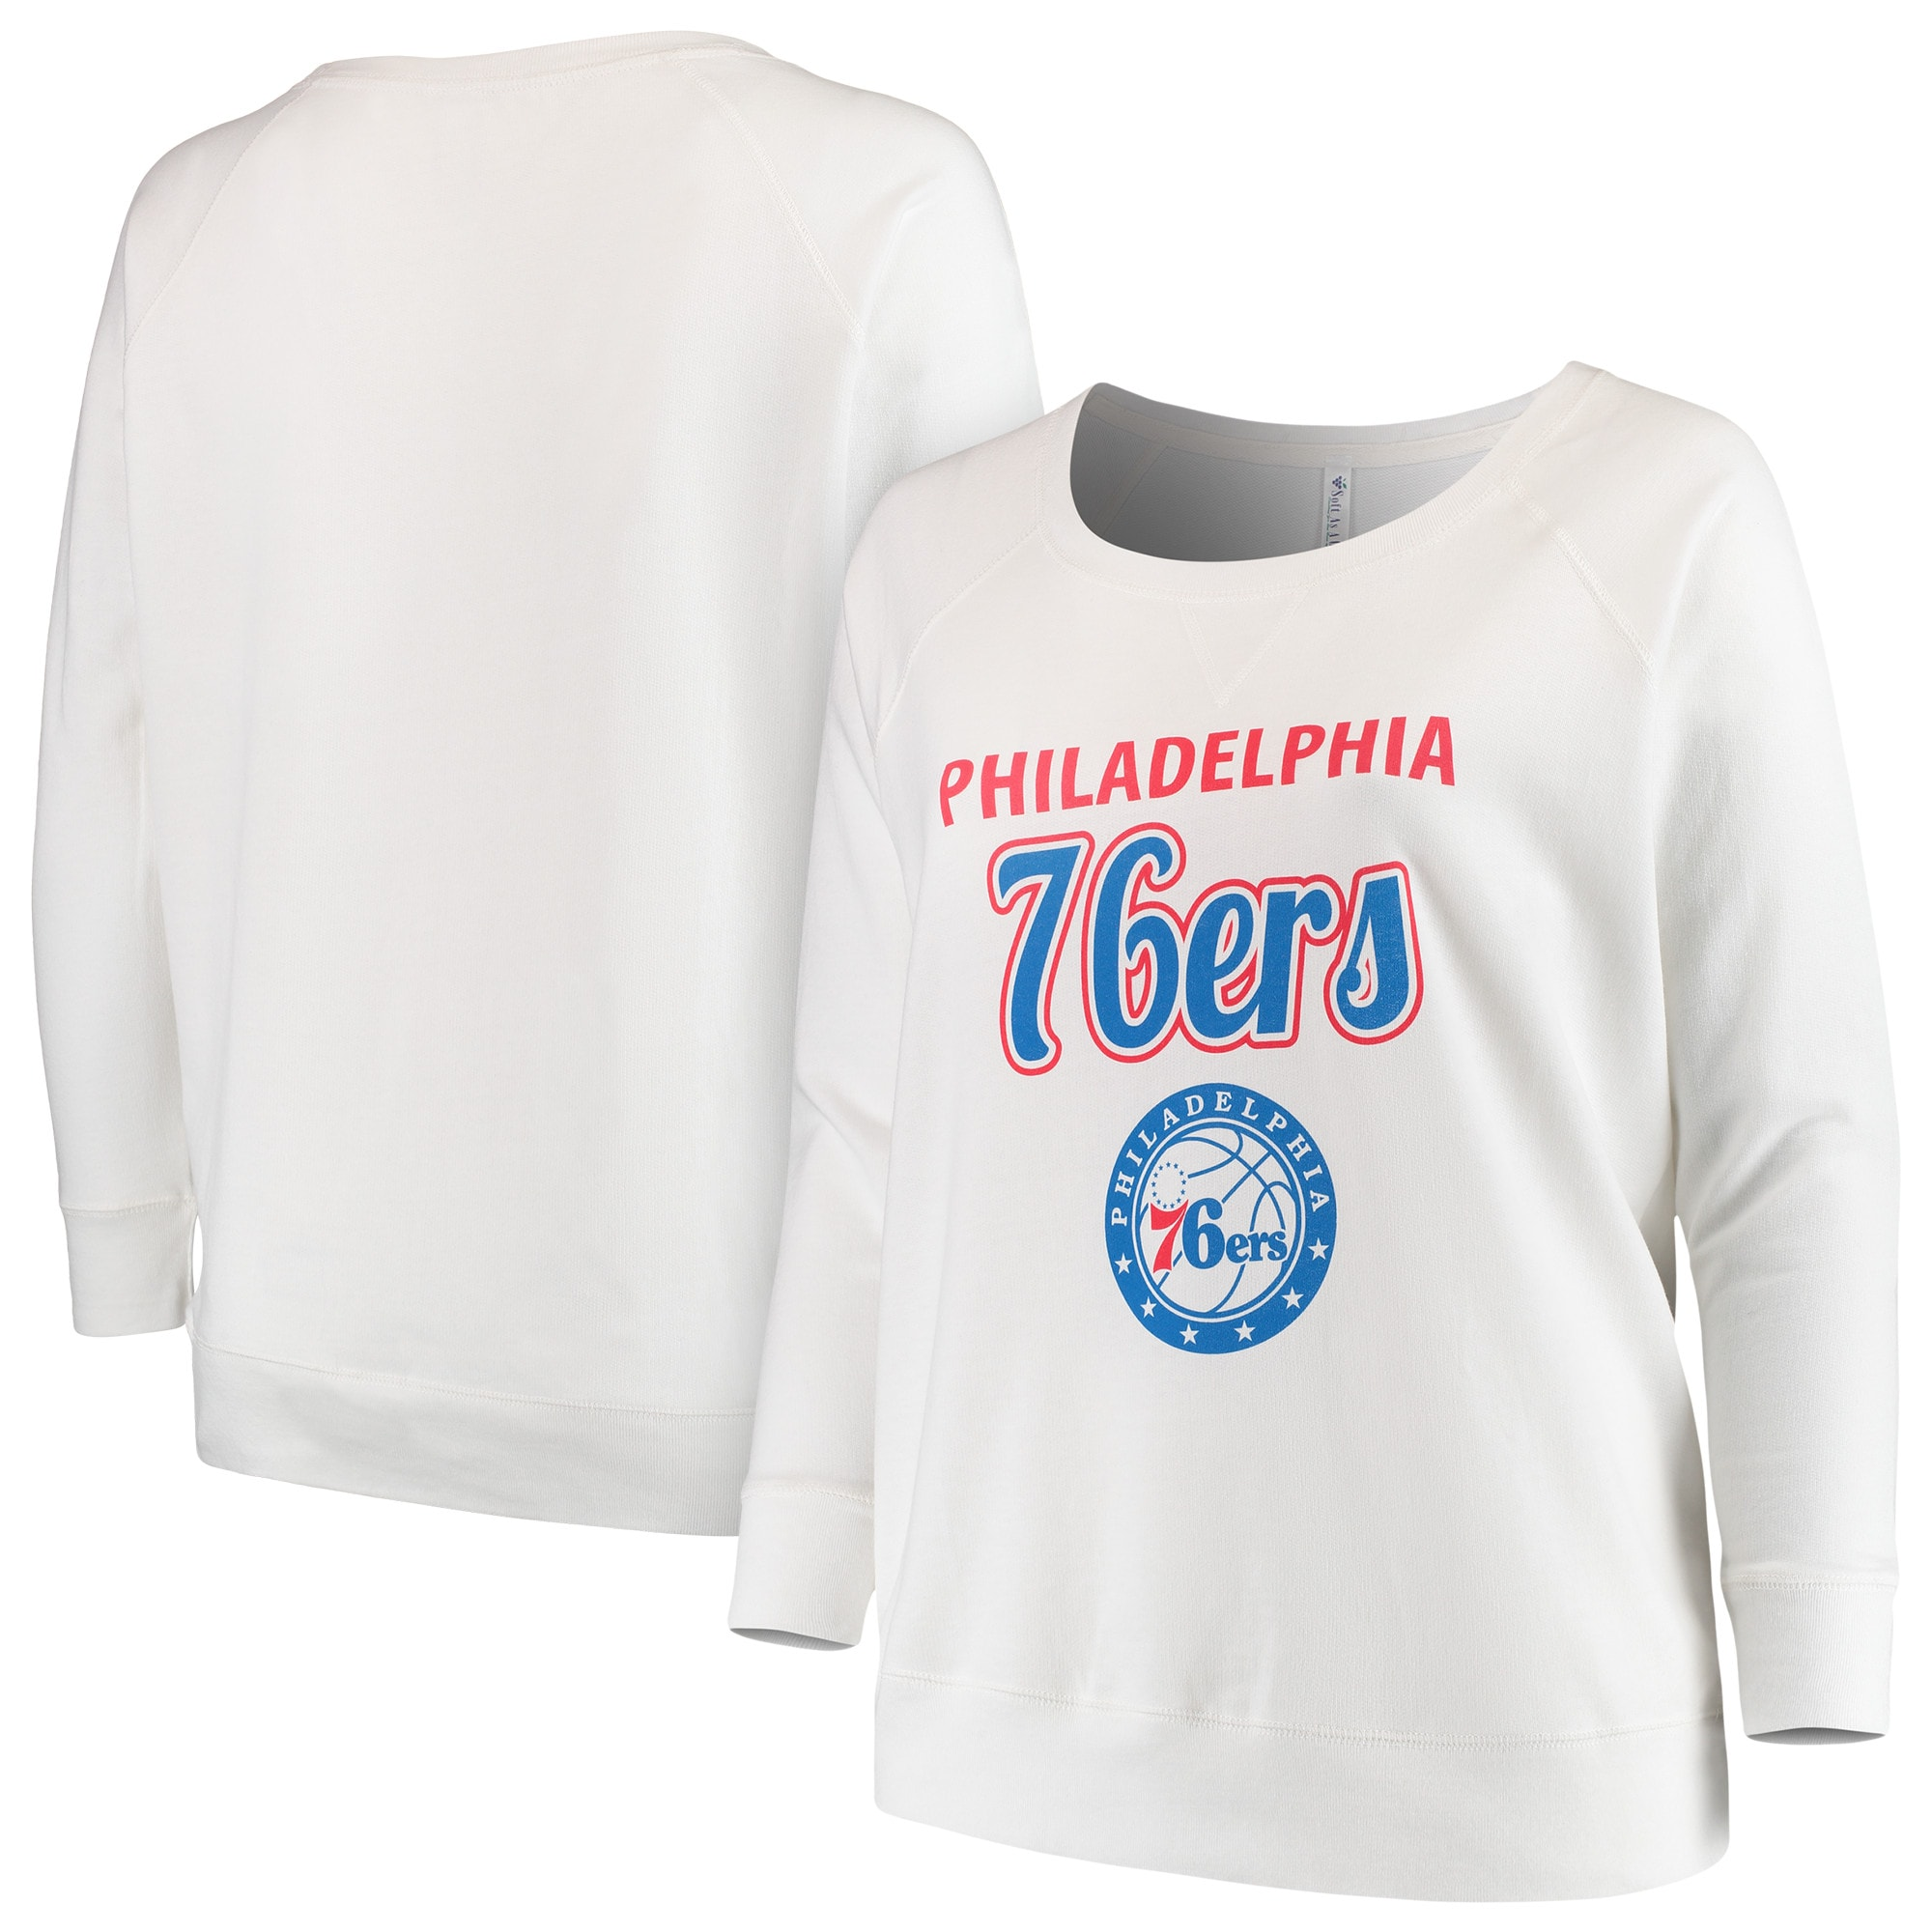 Philadelphia 76ers Soft as a Grape Women's Curvy French Terry Slouch Crew Neck Sweatshirt - White